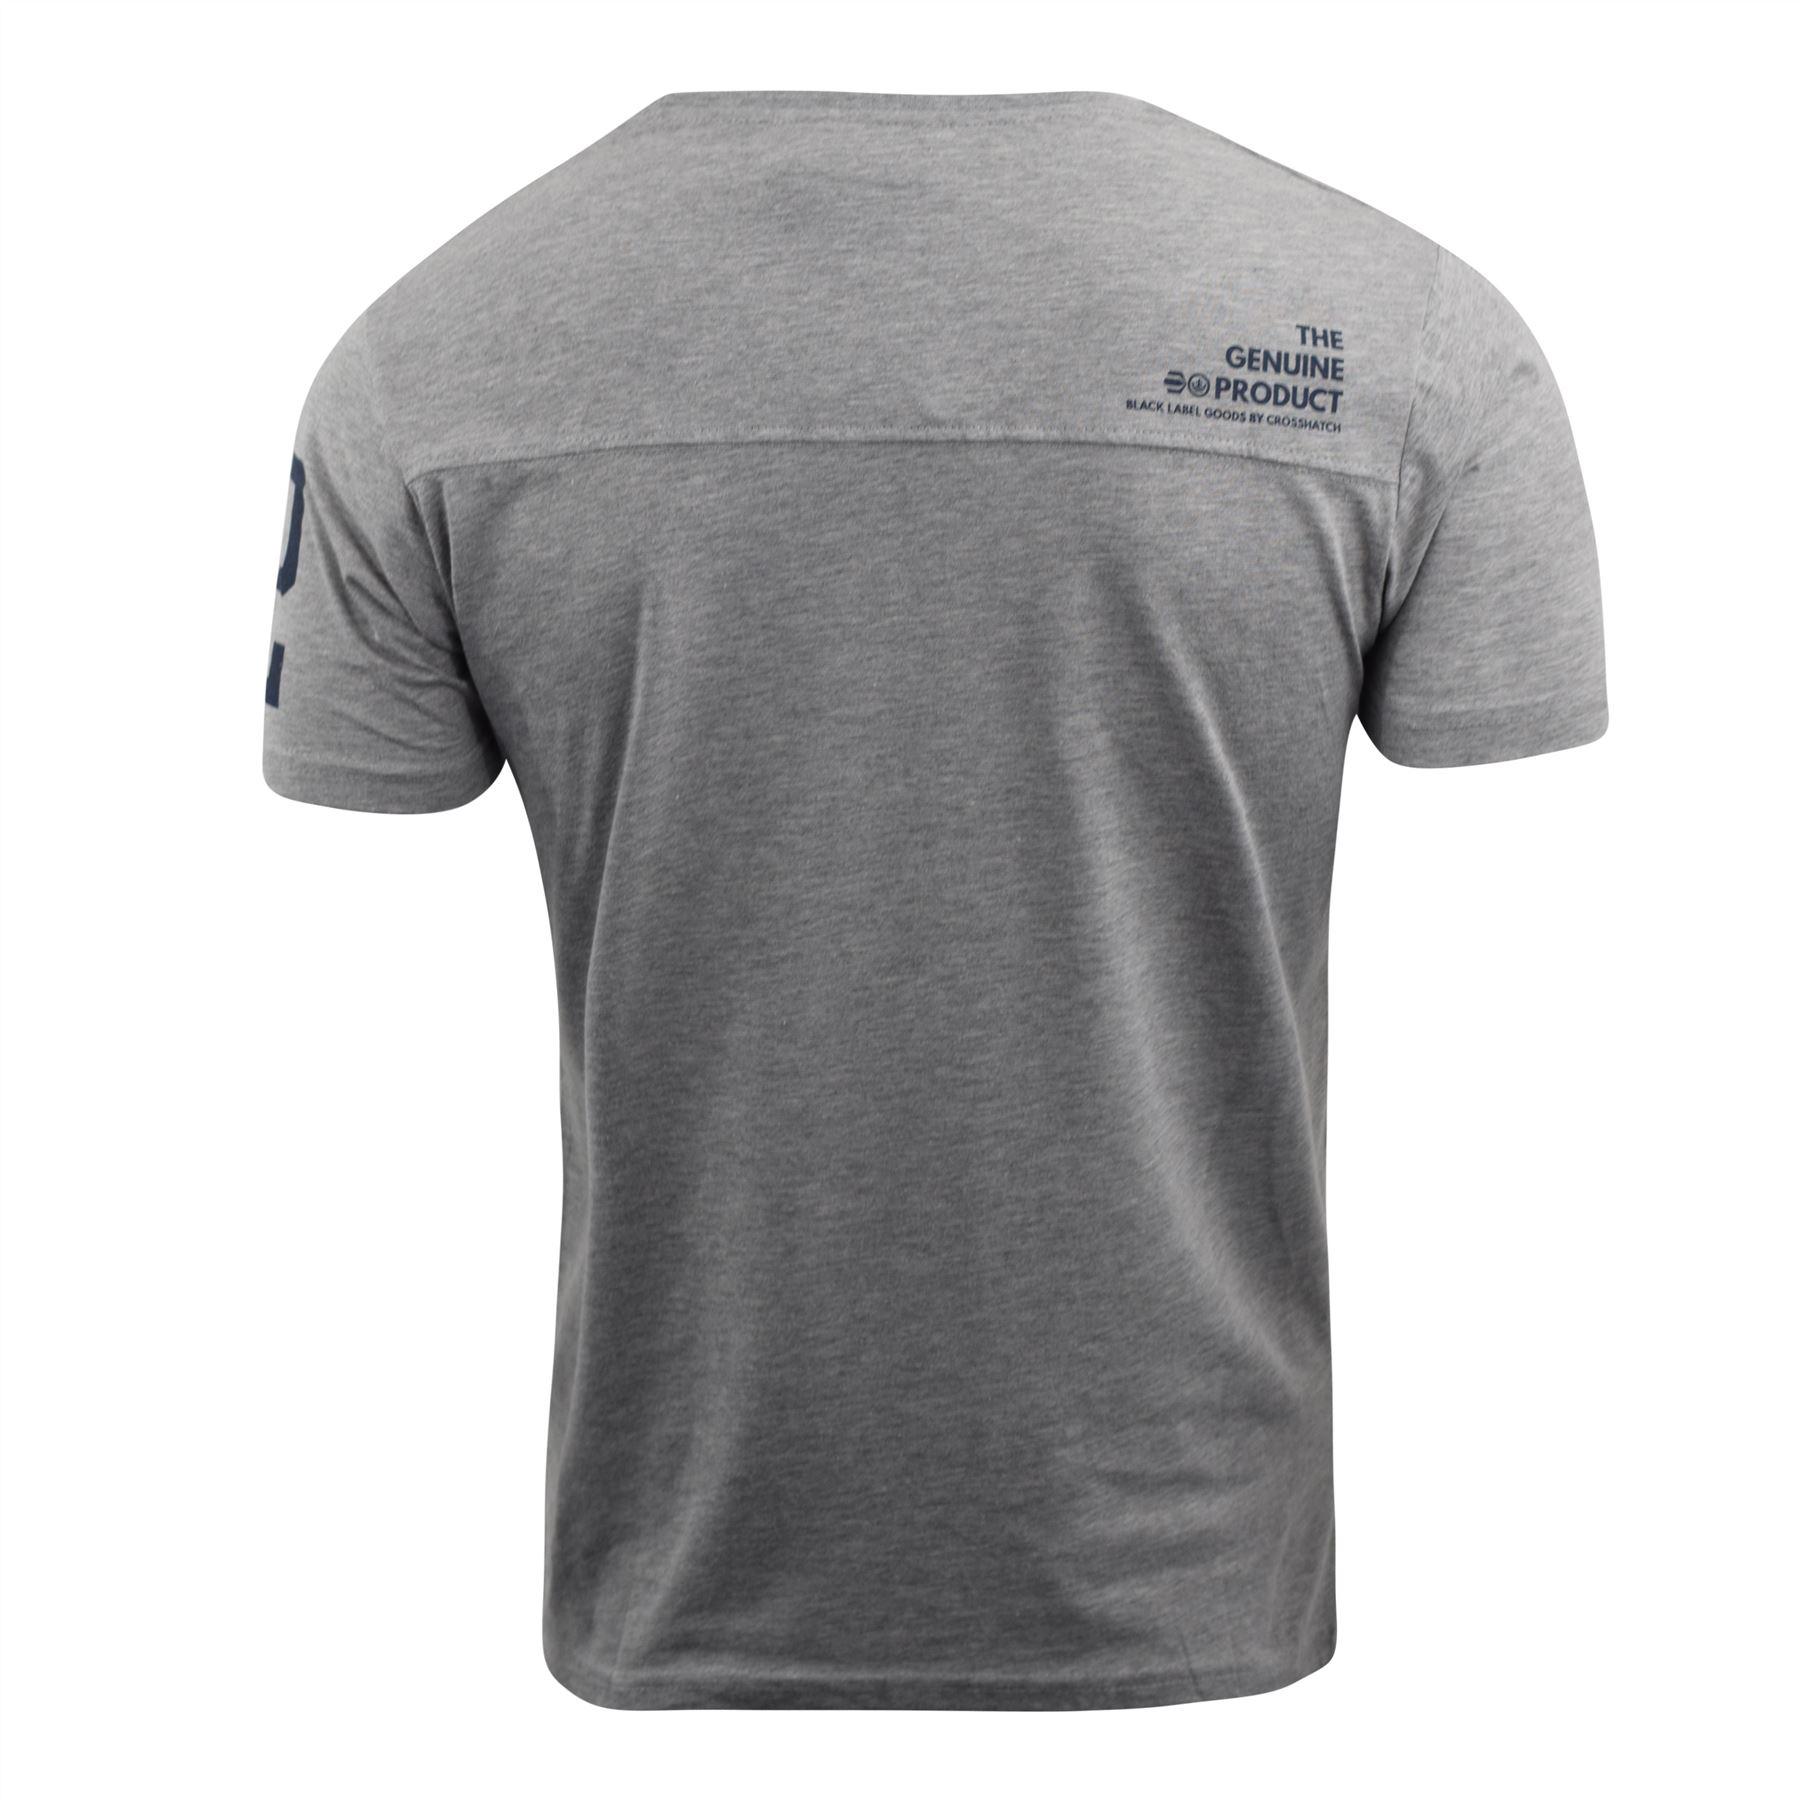 Mens-Crosshatch-T-Shirt-Contrast-Short-Sleeve-Tee-Top-Penycoat thumbnail 7